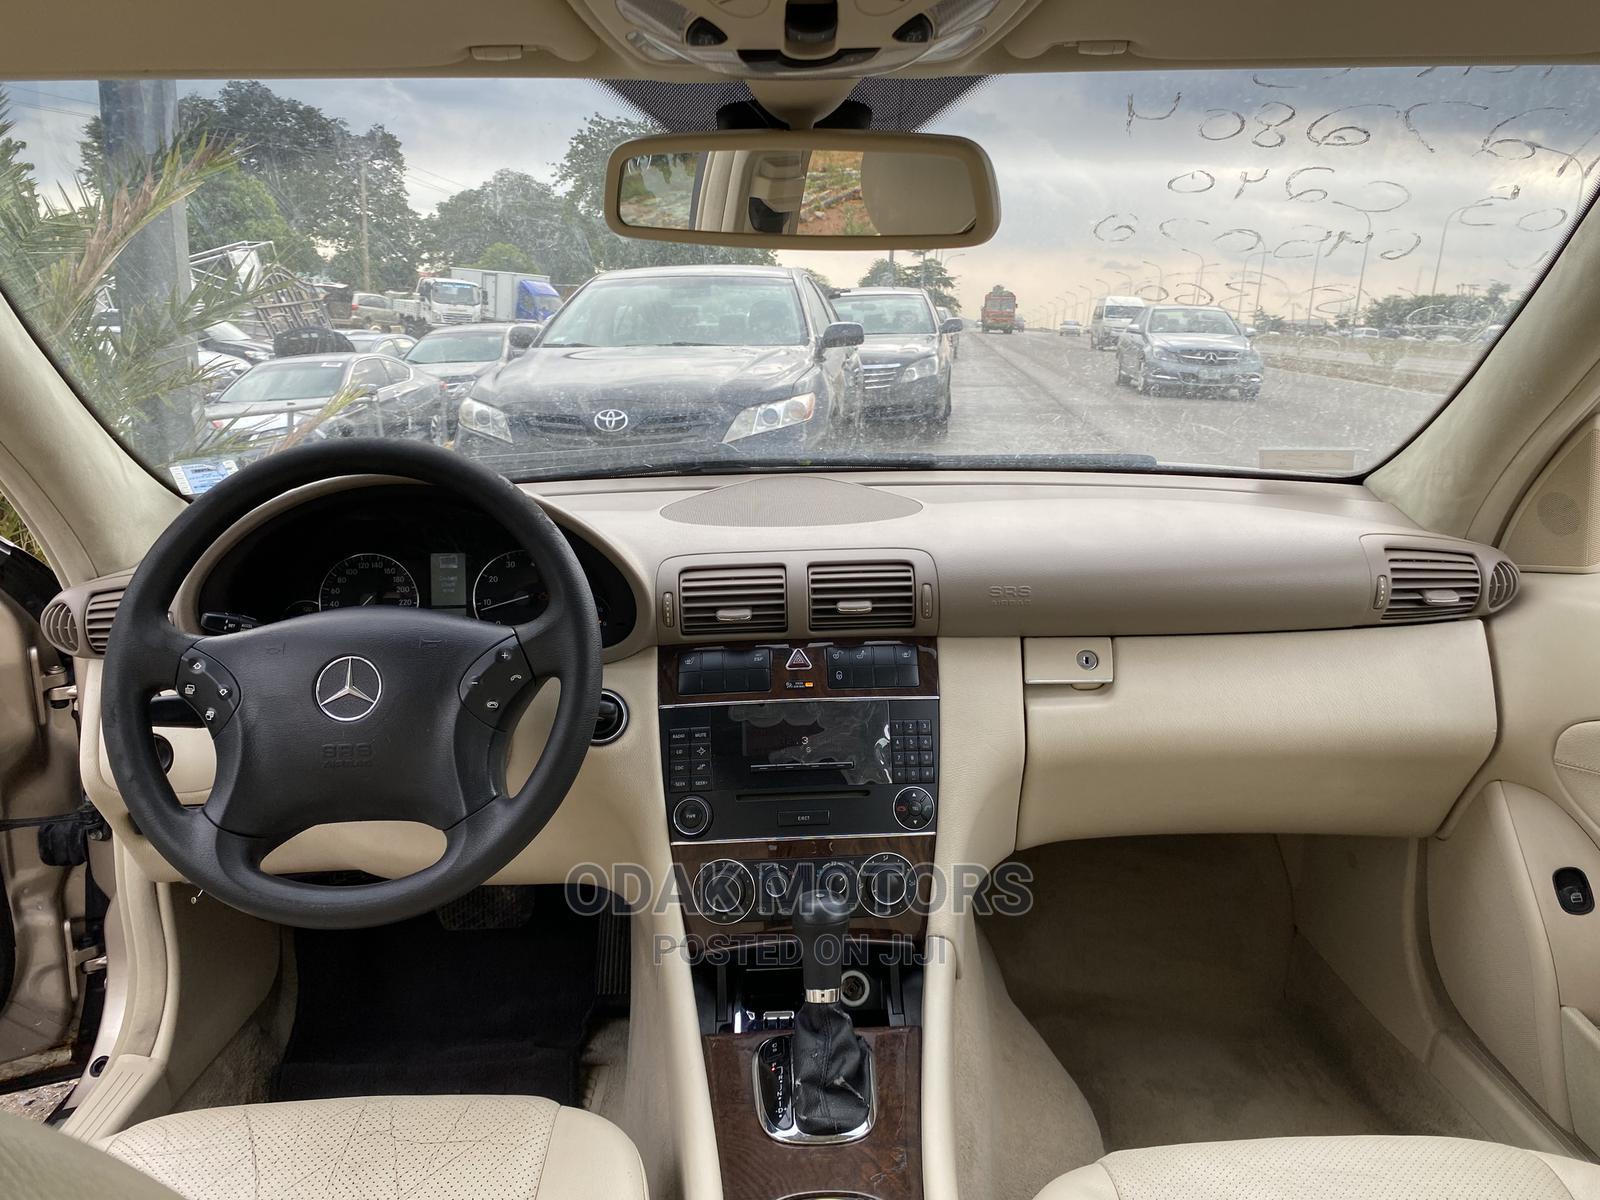 Mercedes-Benz C240 2005 Gold | Cars for sale in Gwarinpa, Abuja (FCT) State, Nigeria